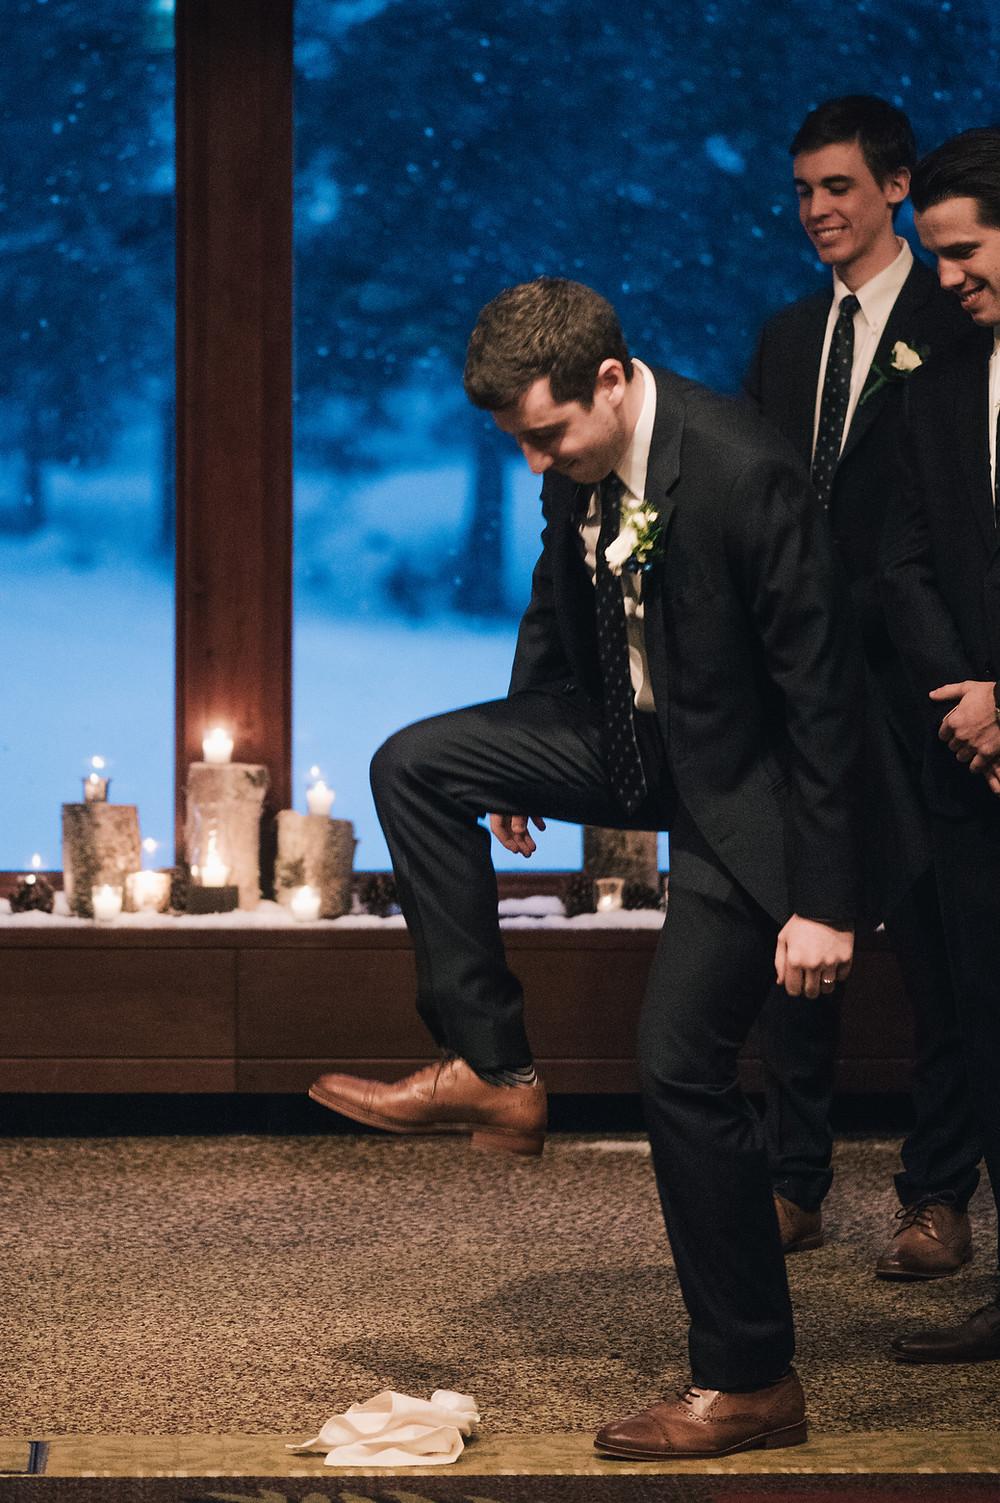 jewish wedding tradition, break the glass, Alyeska wedding